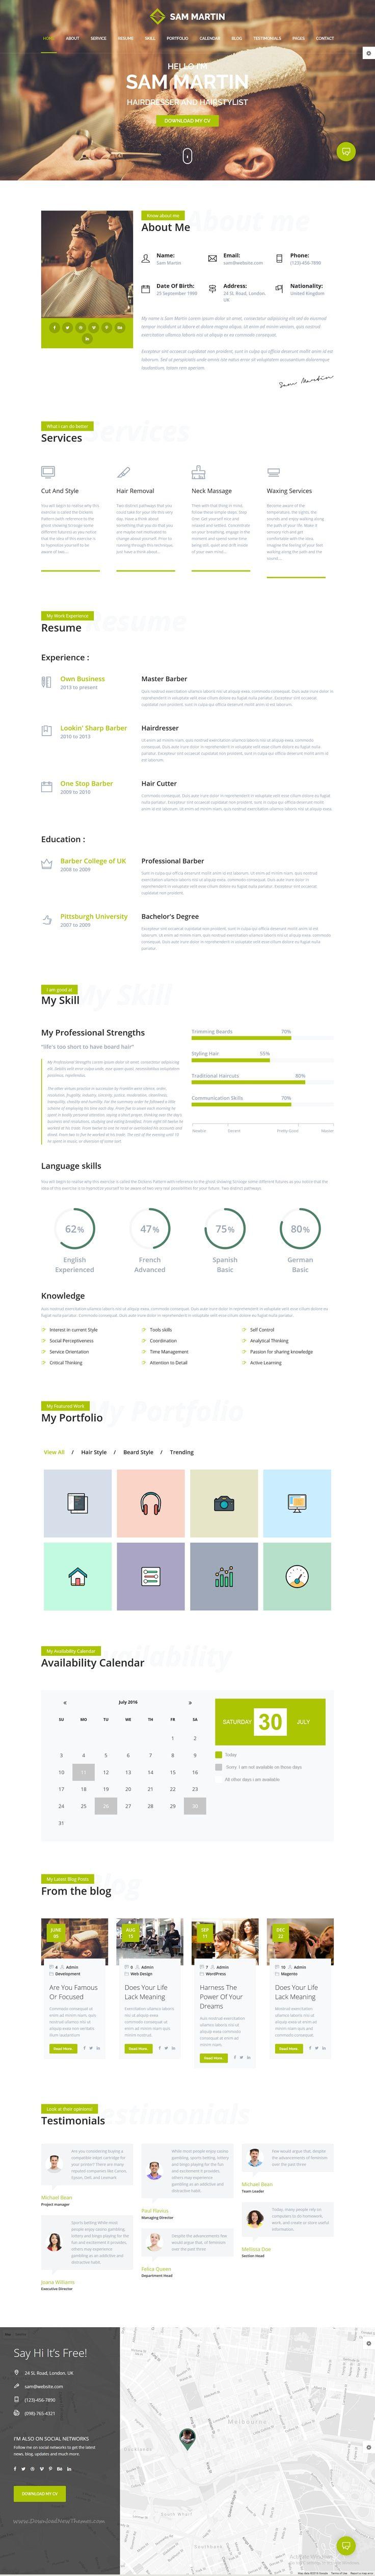 Sam Martin is an elegant, Bootstrap HTML #portfolio template for #beautician #barber vCard, #resume website download now➝ https://themeforest.net/item/sam-martin-personal-vcard-resume-html-template/16795240?ref=Datasata